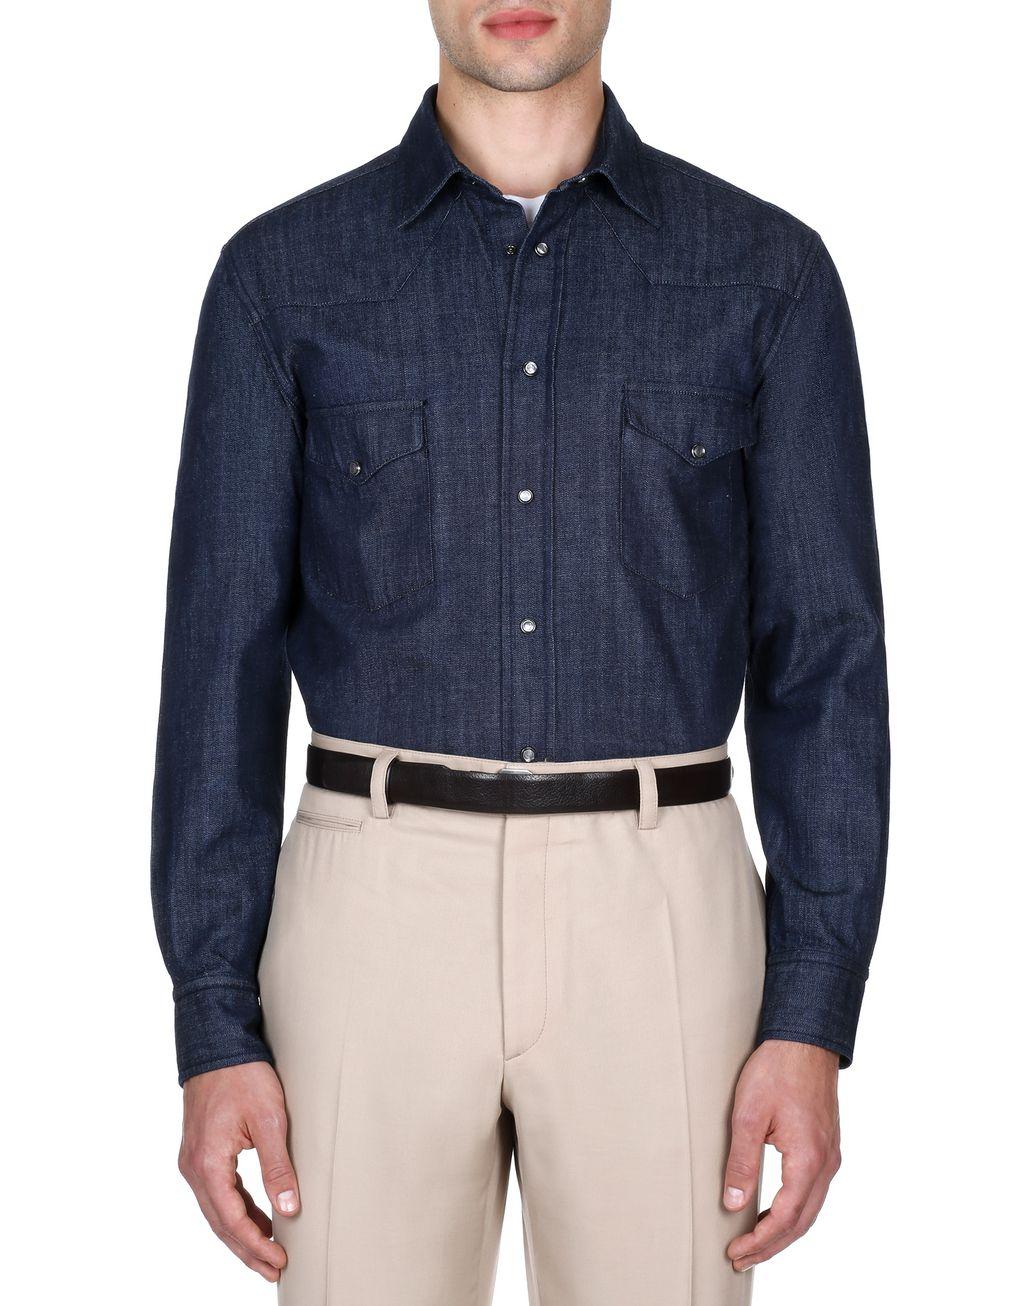 BRIONI Тёмно-синяя джинсовая рубашка Pубашка Для Мужчин r